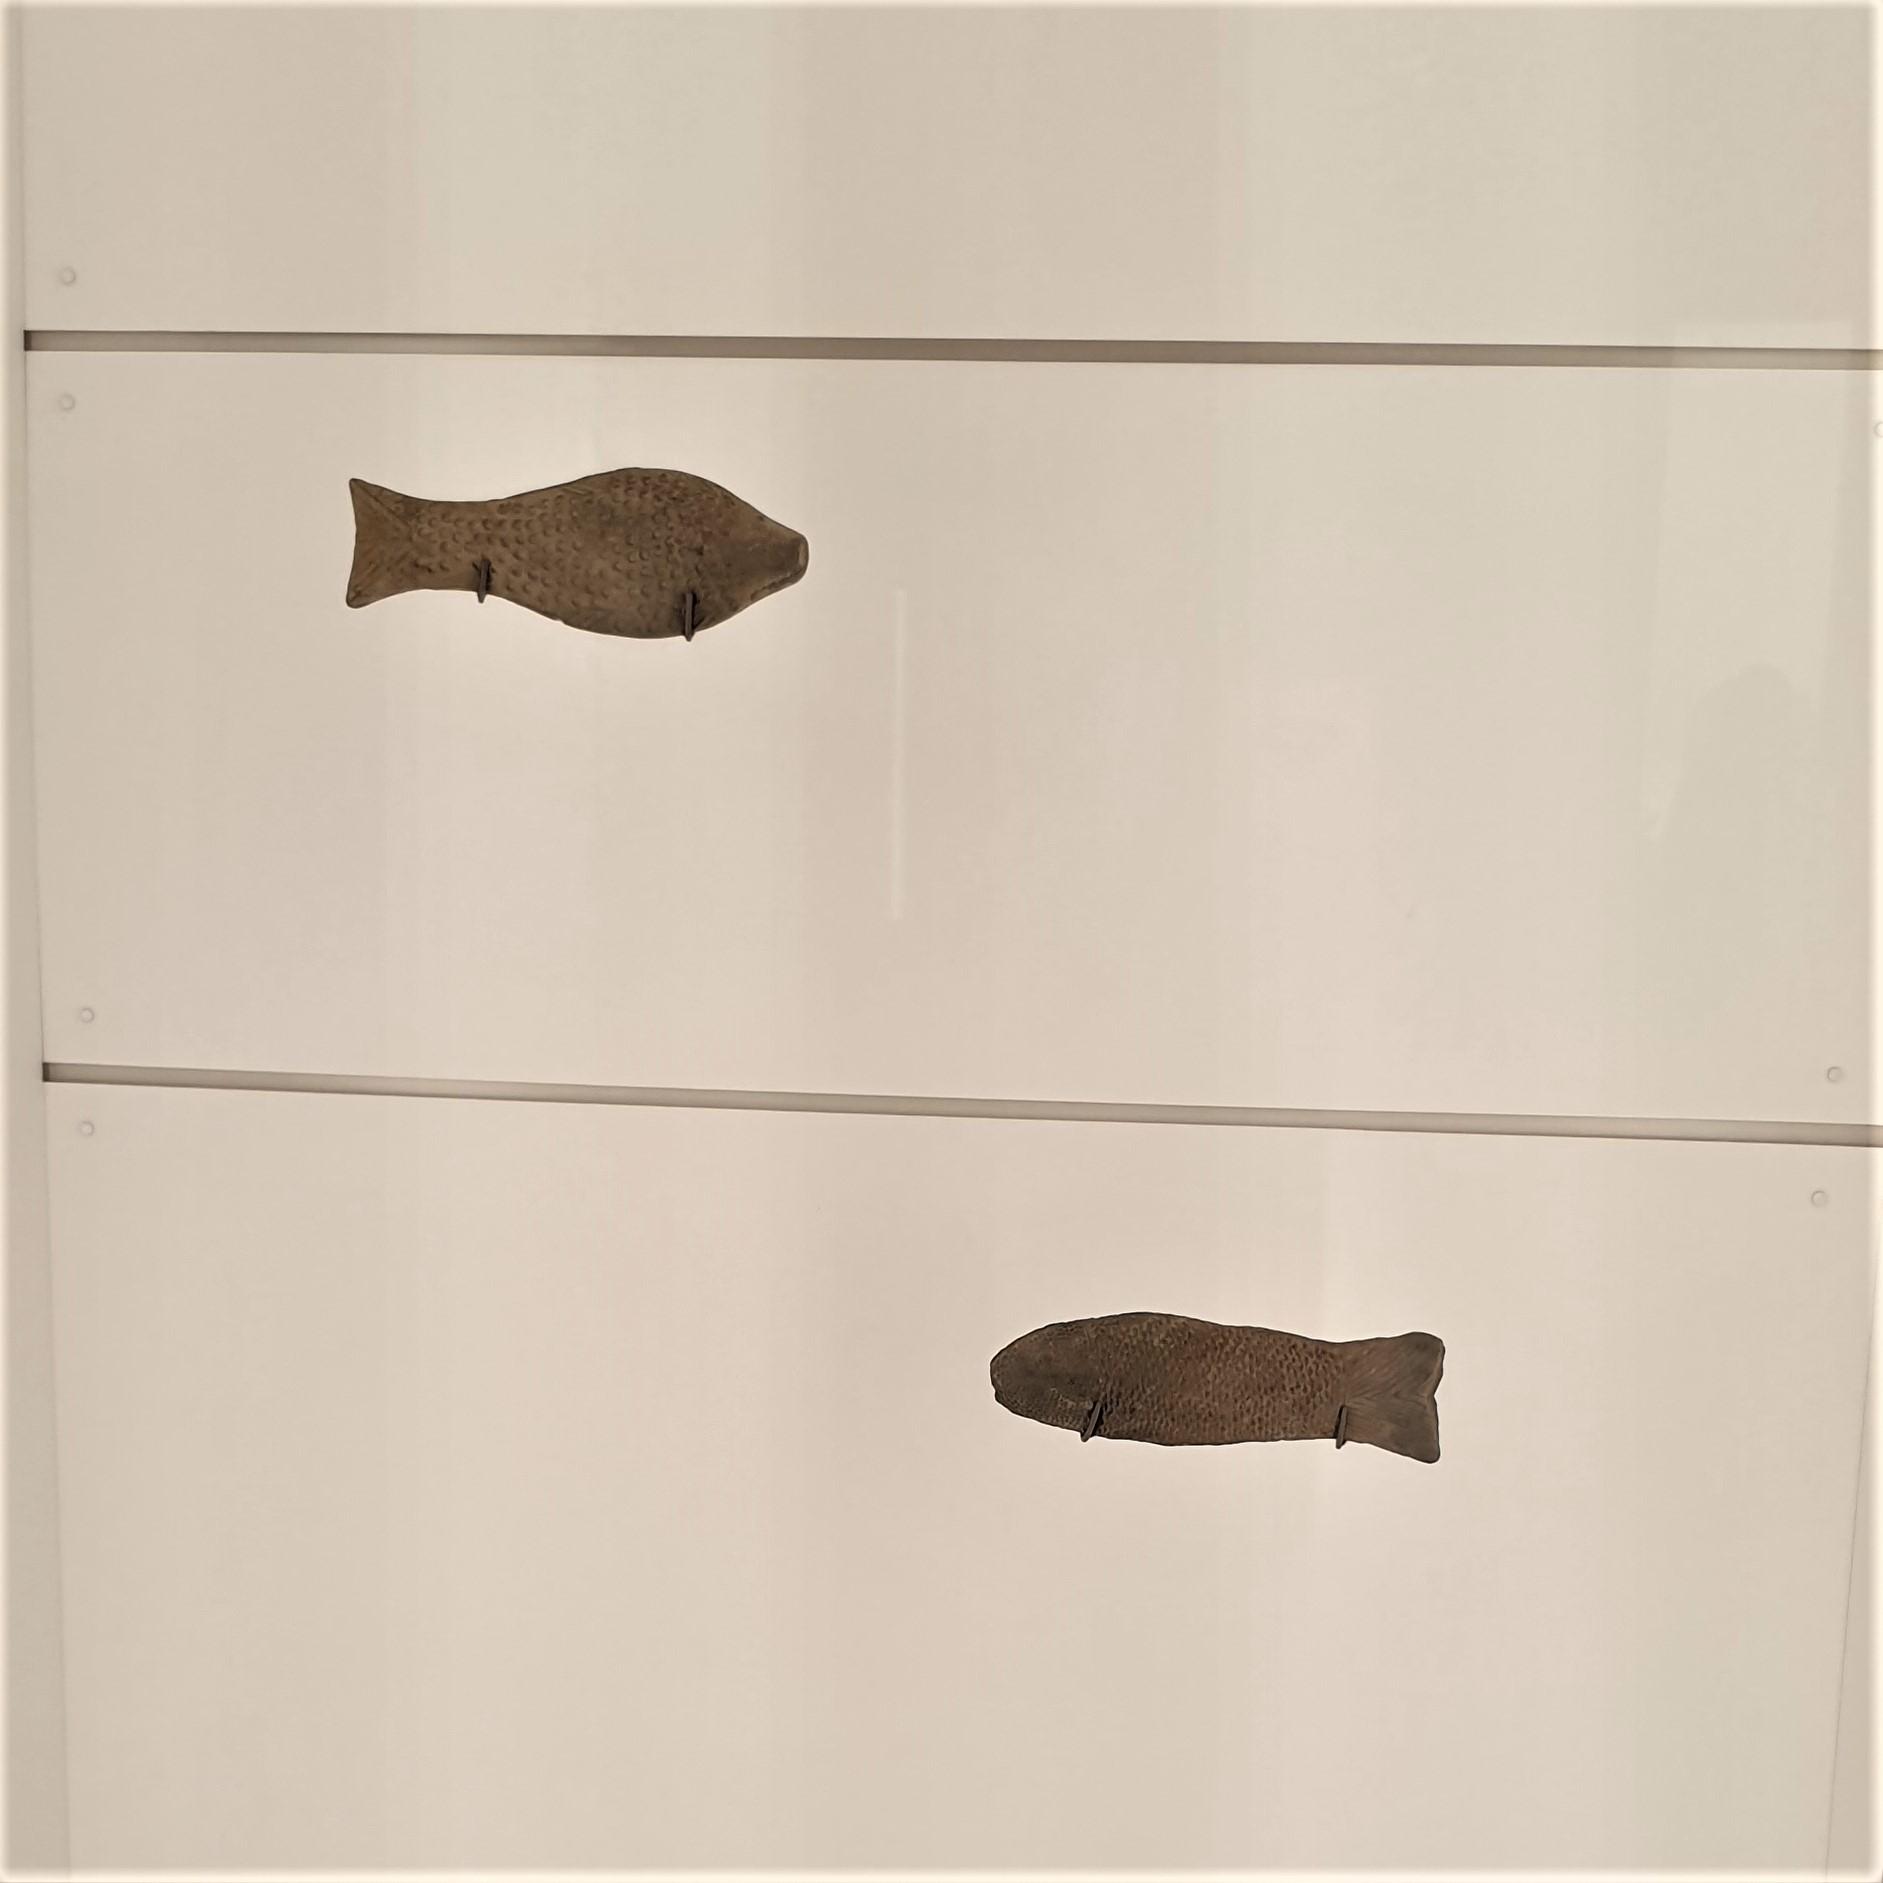 Toy Fish. Qin dynasty 221-207 BCE. Earthenware. Photograph by Rasheeda Wilson.